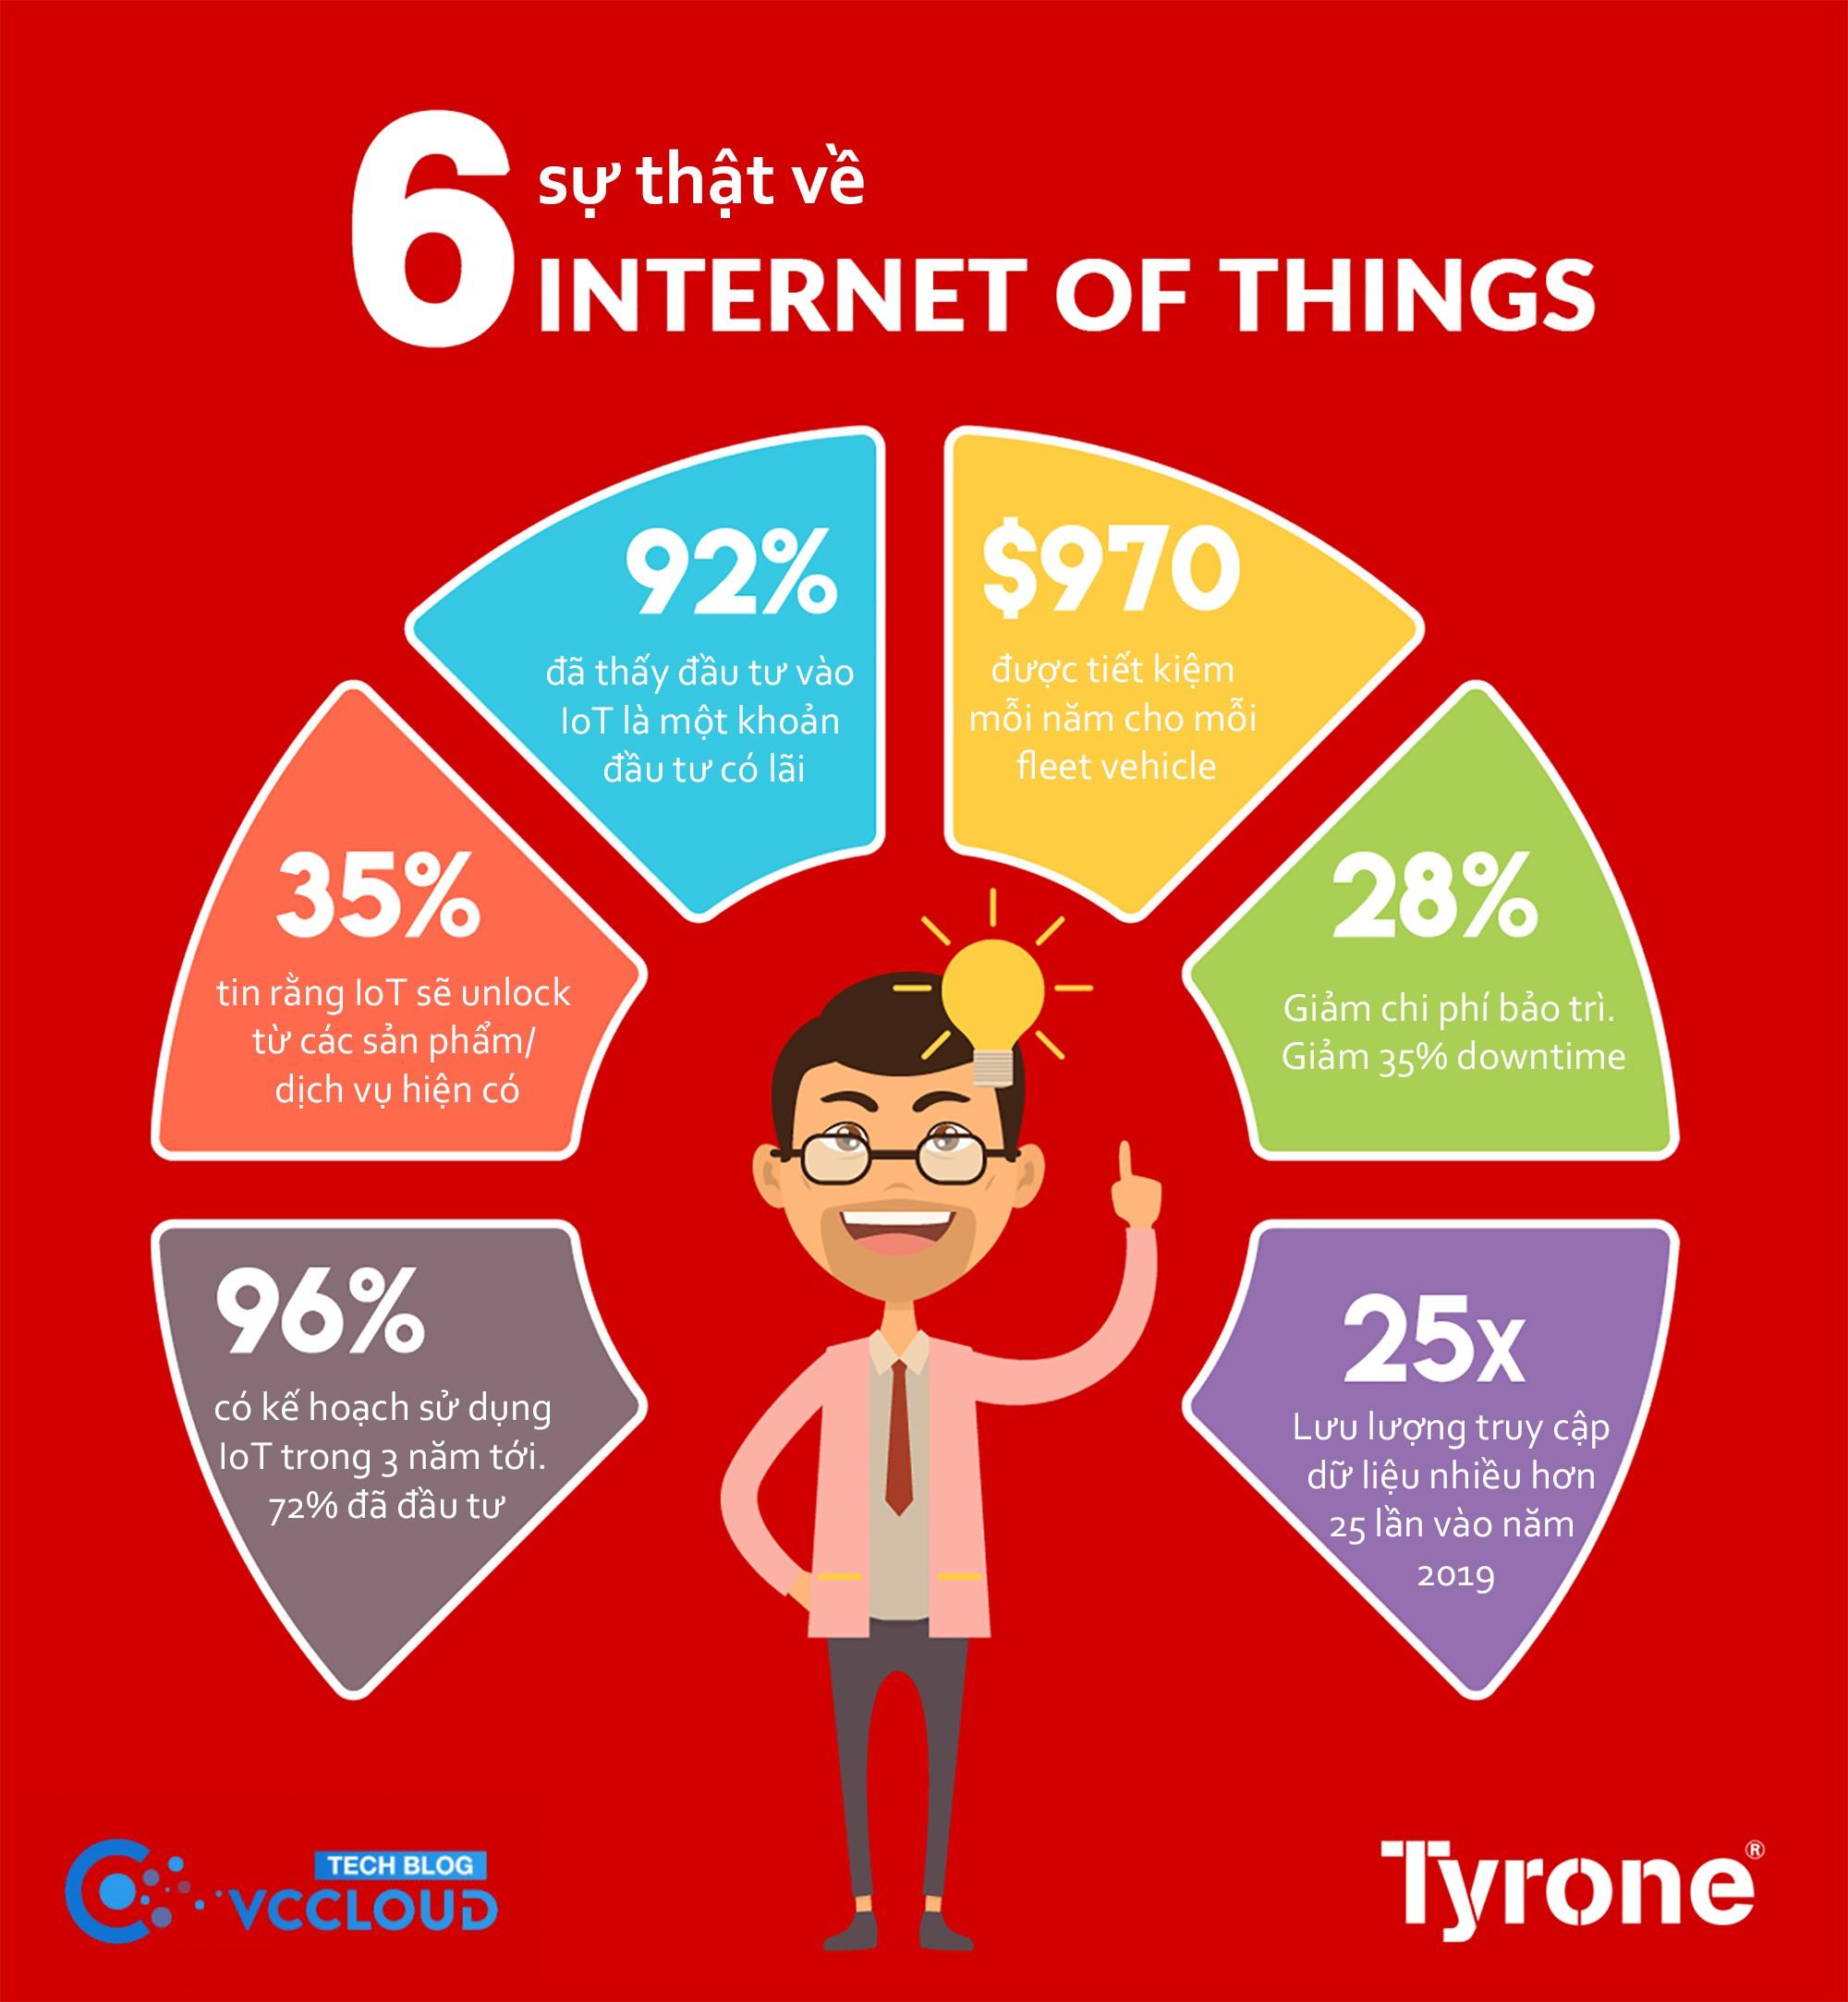 [Infographic] 6 sự thật về Internet Of Things - Ảnh 1.